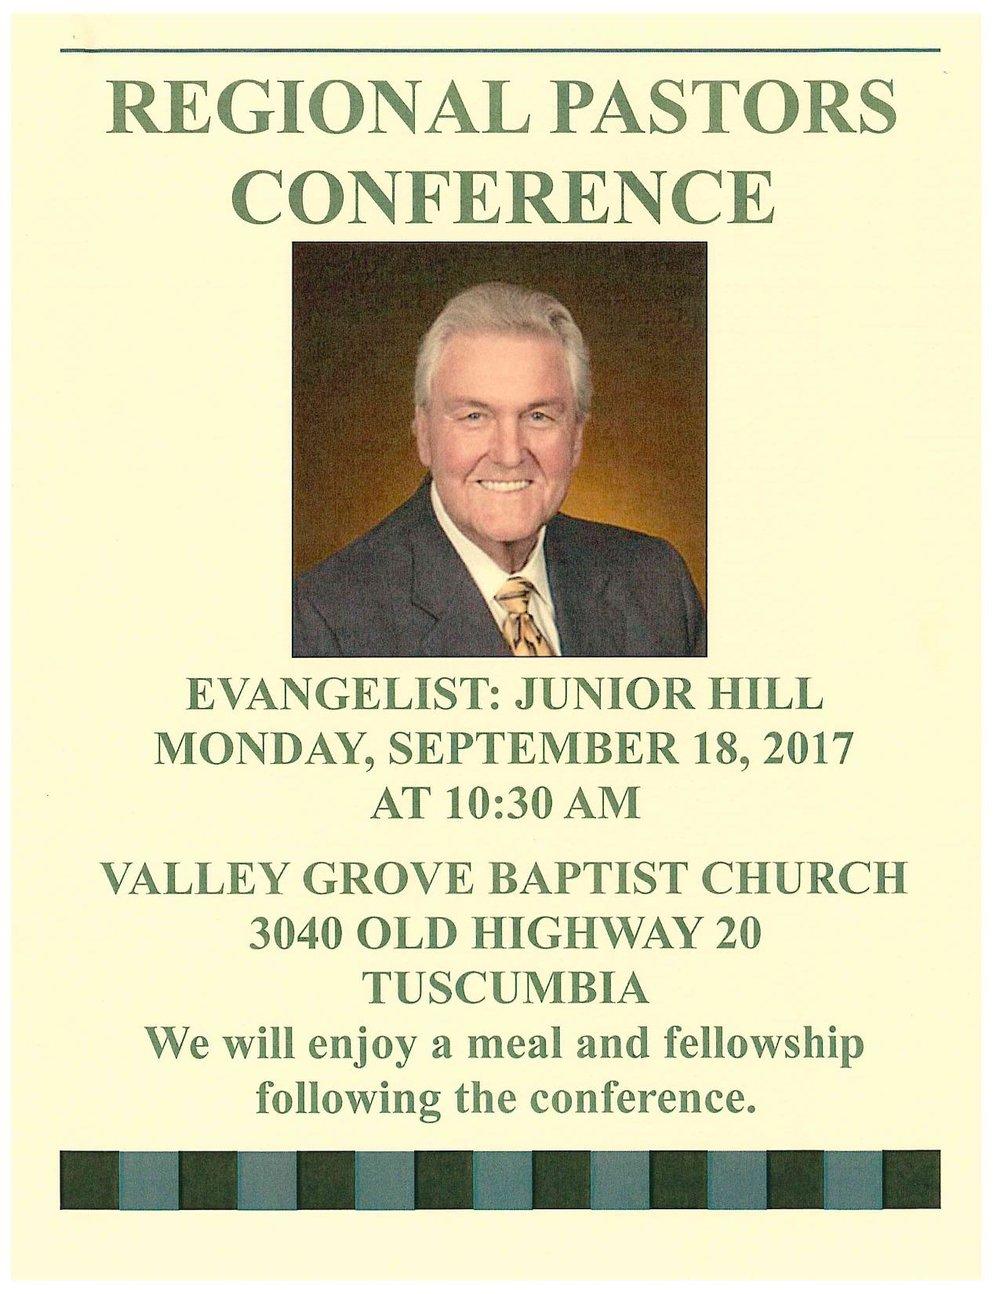 Regional Pastors Conference Flier 2017-page-001.jpg